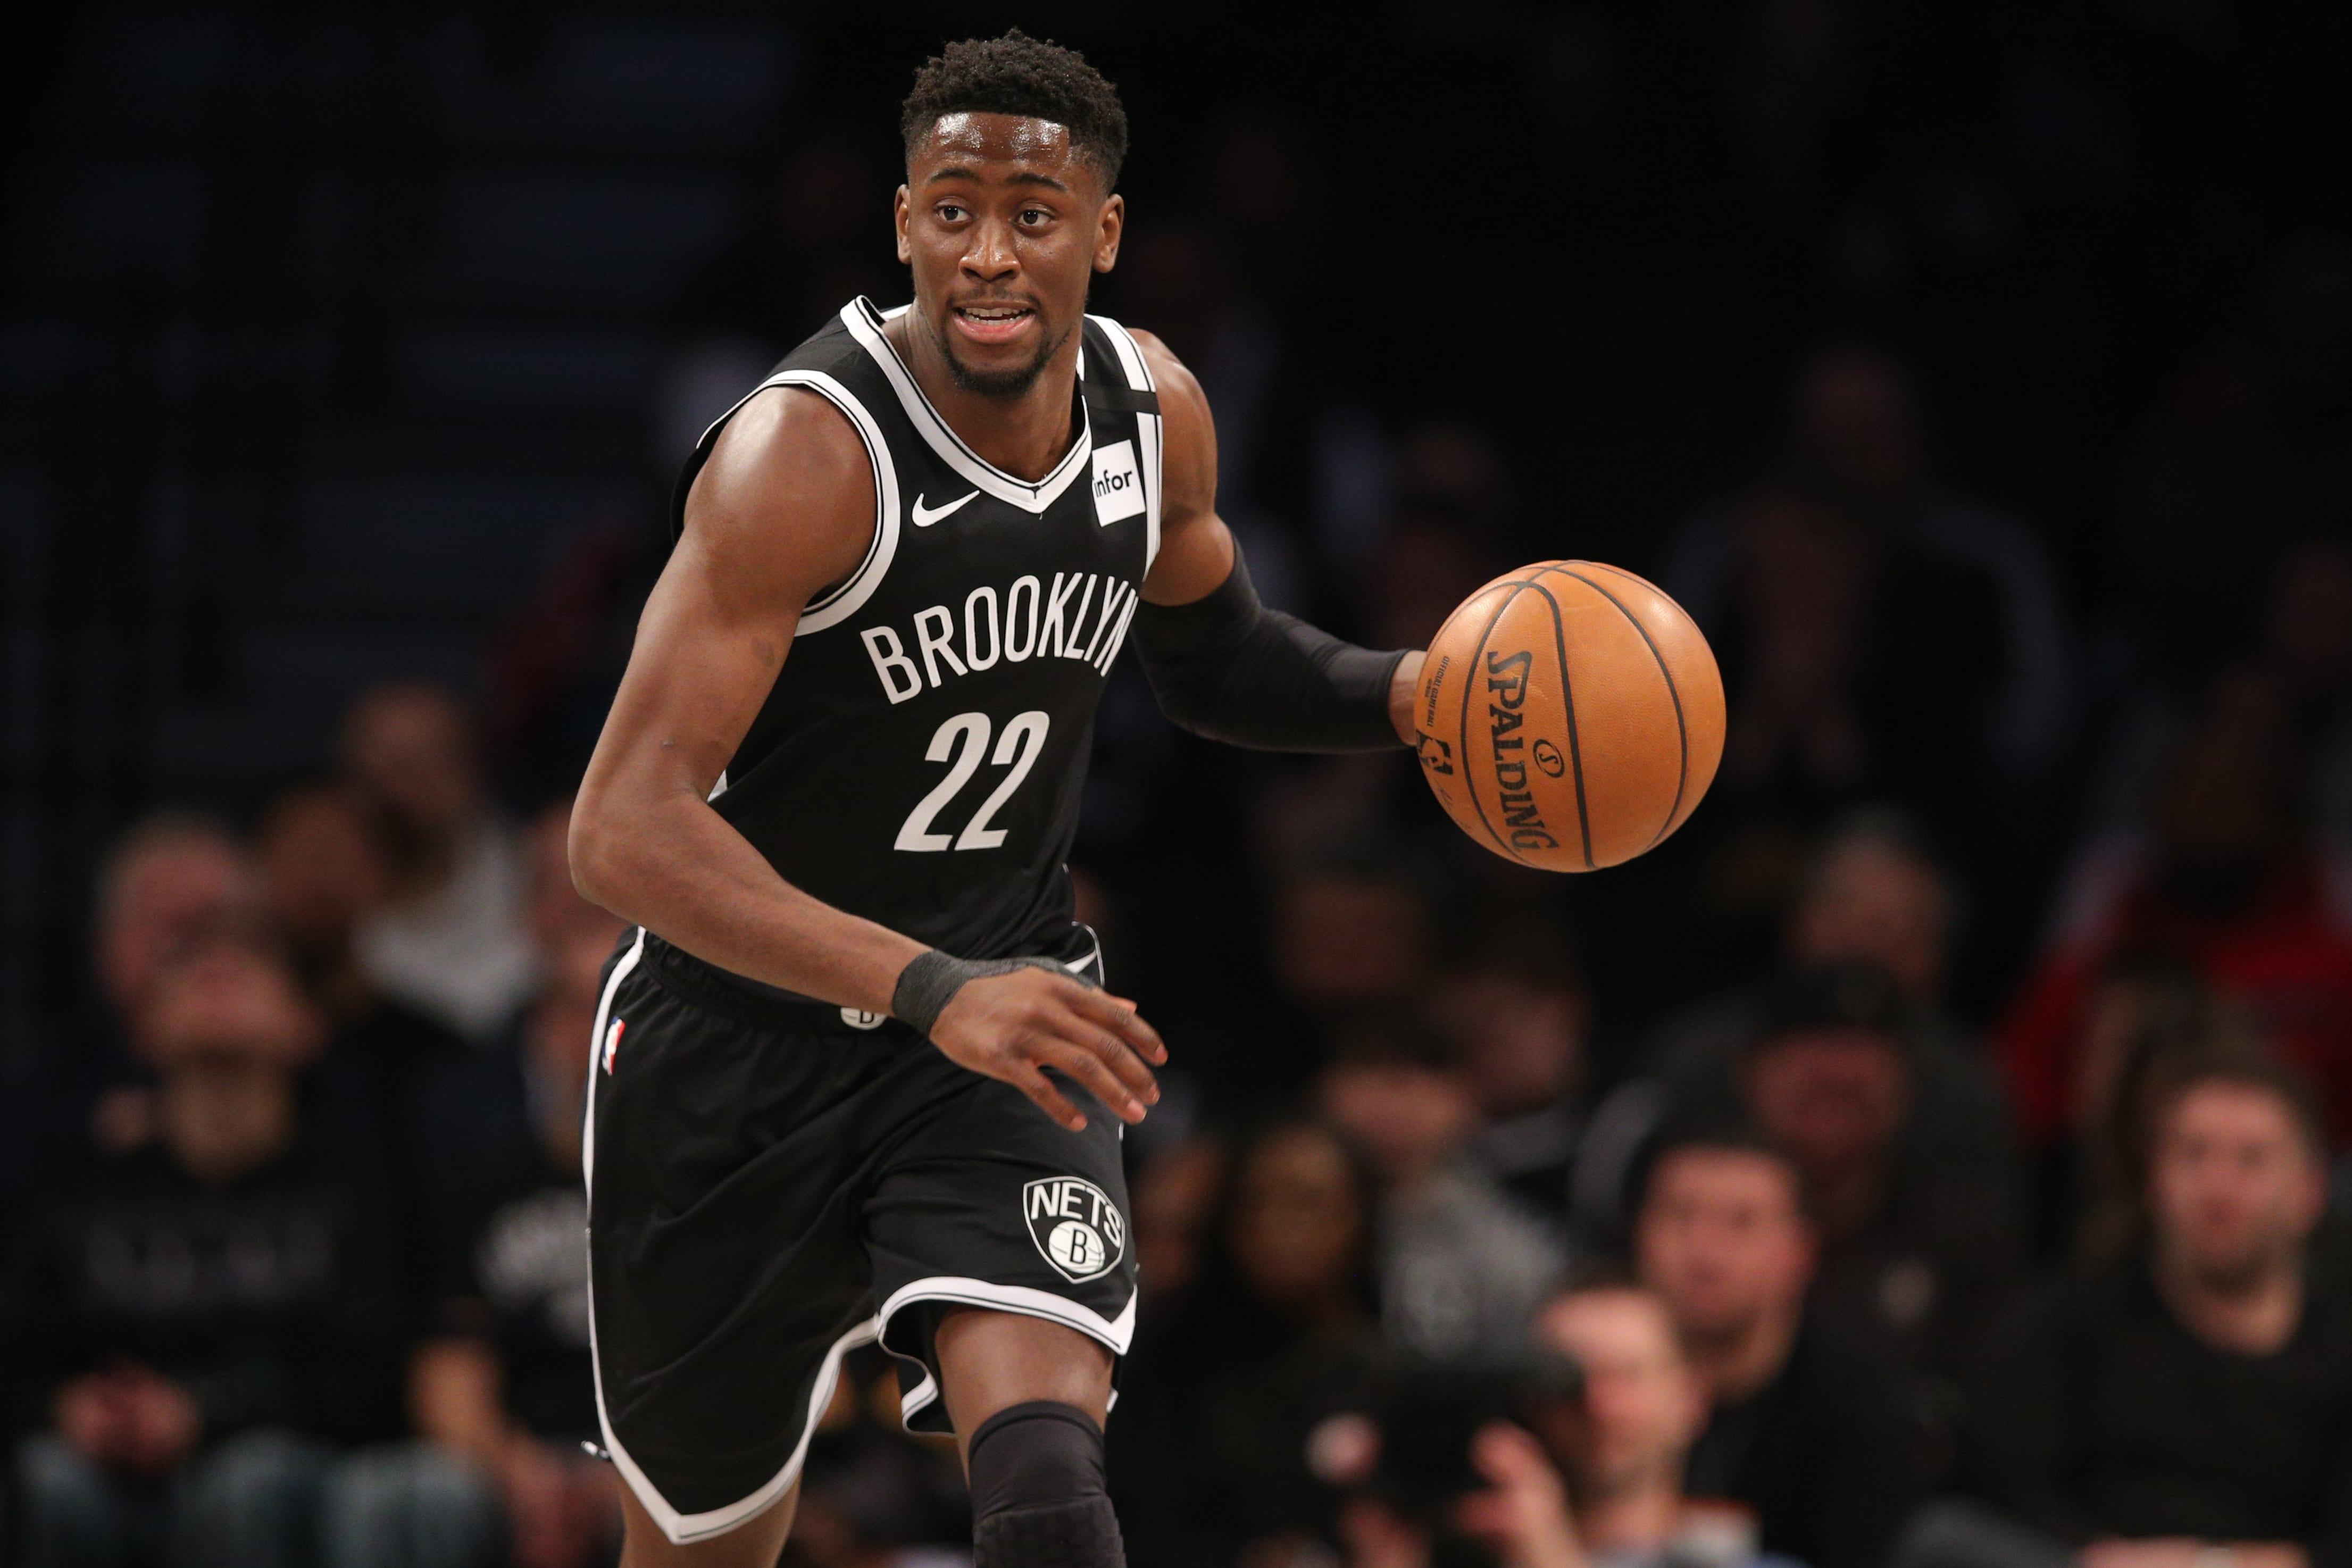 Brooklyn Nets, Caris LeVert